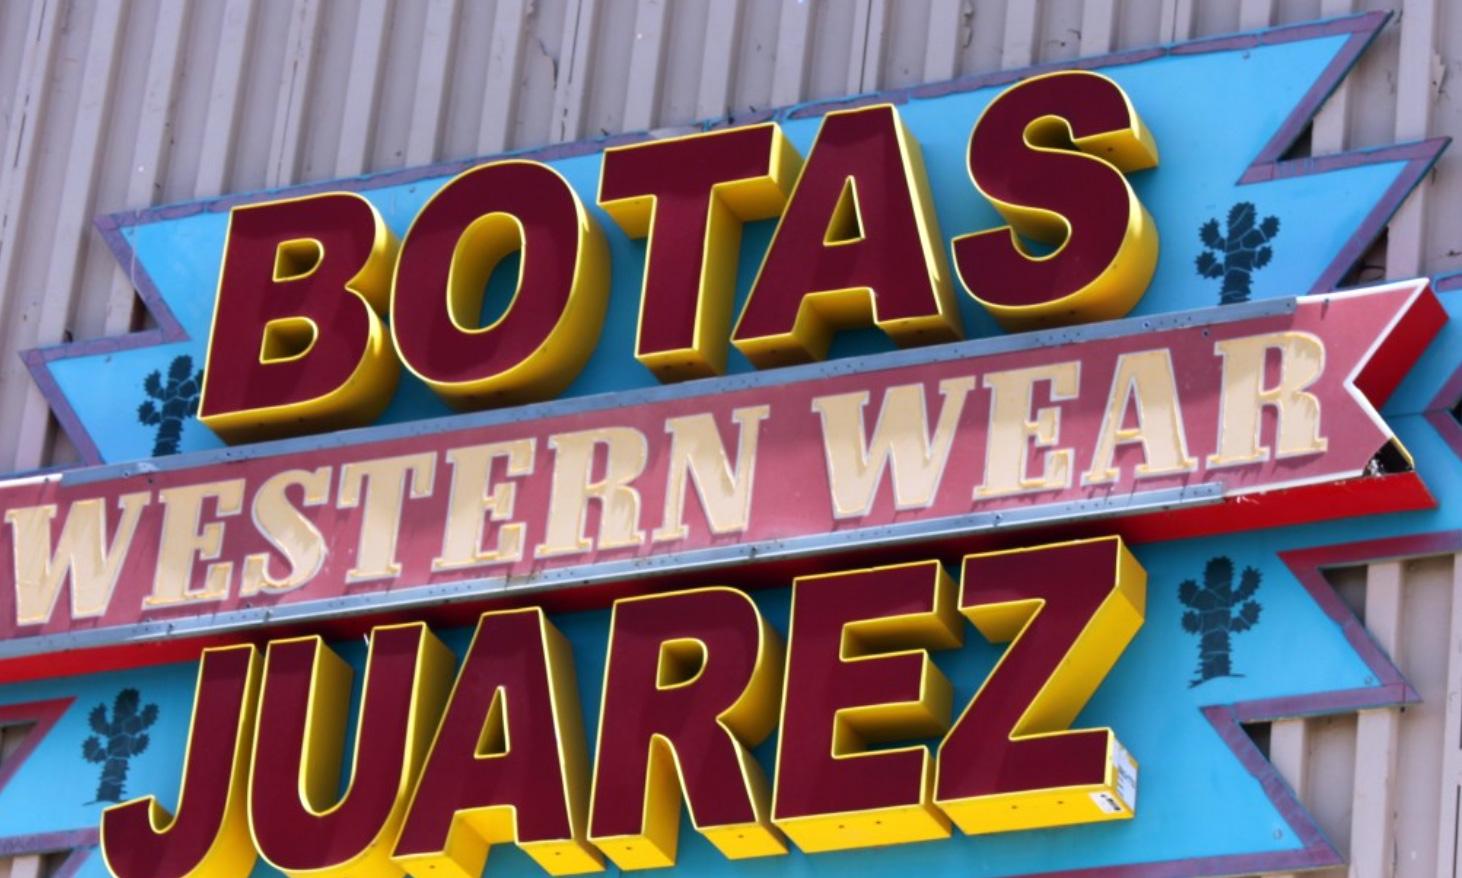 botas-juarez-western-wear-phx